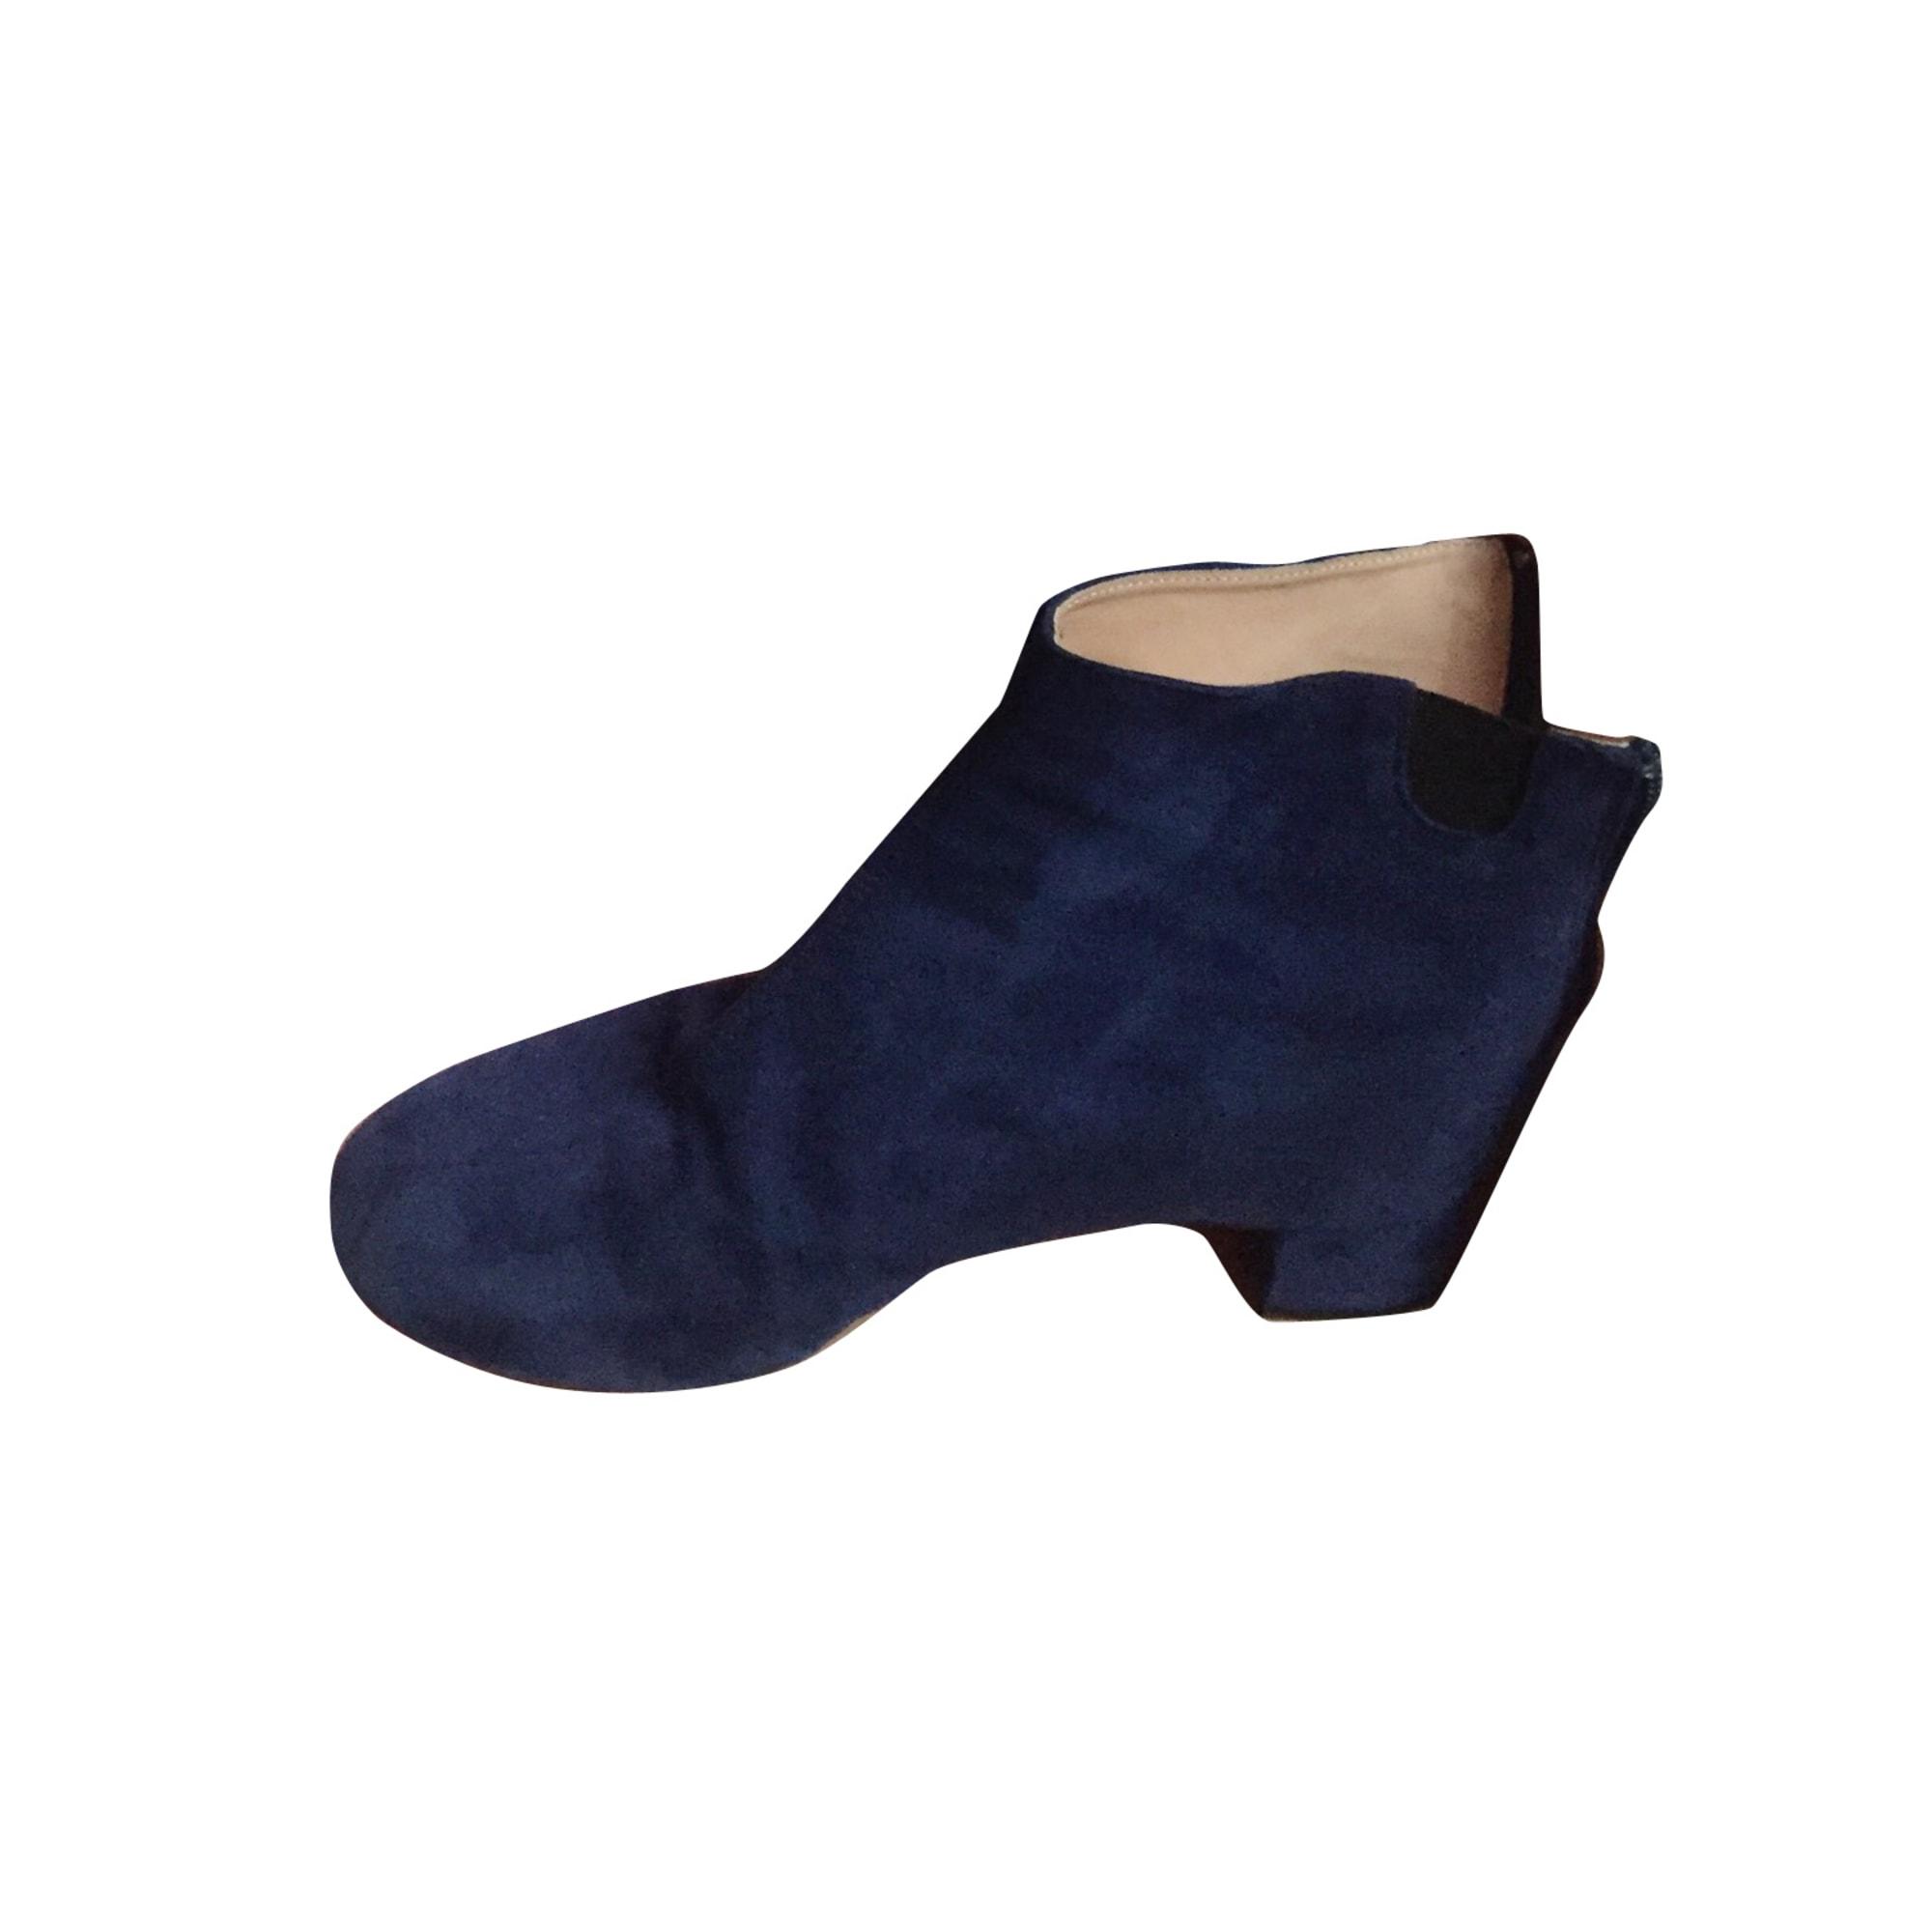 Bottines & low boots plates REPETTO Bleu, bleu marine, bleu turquoise